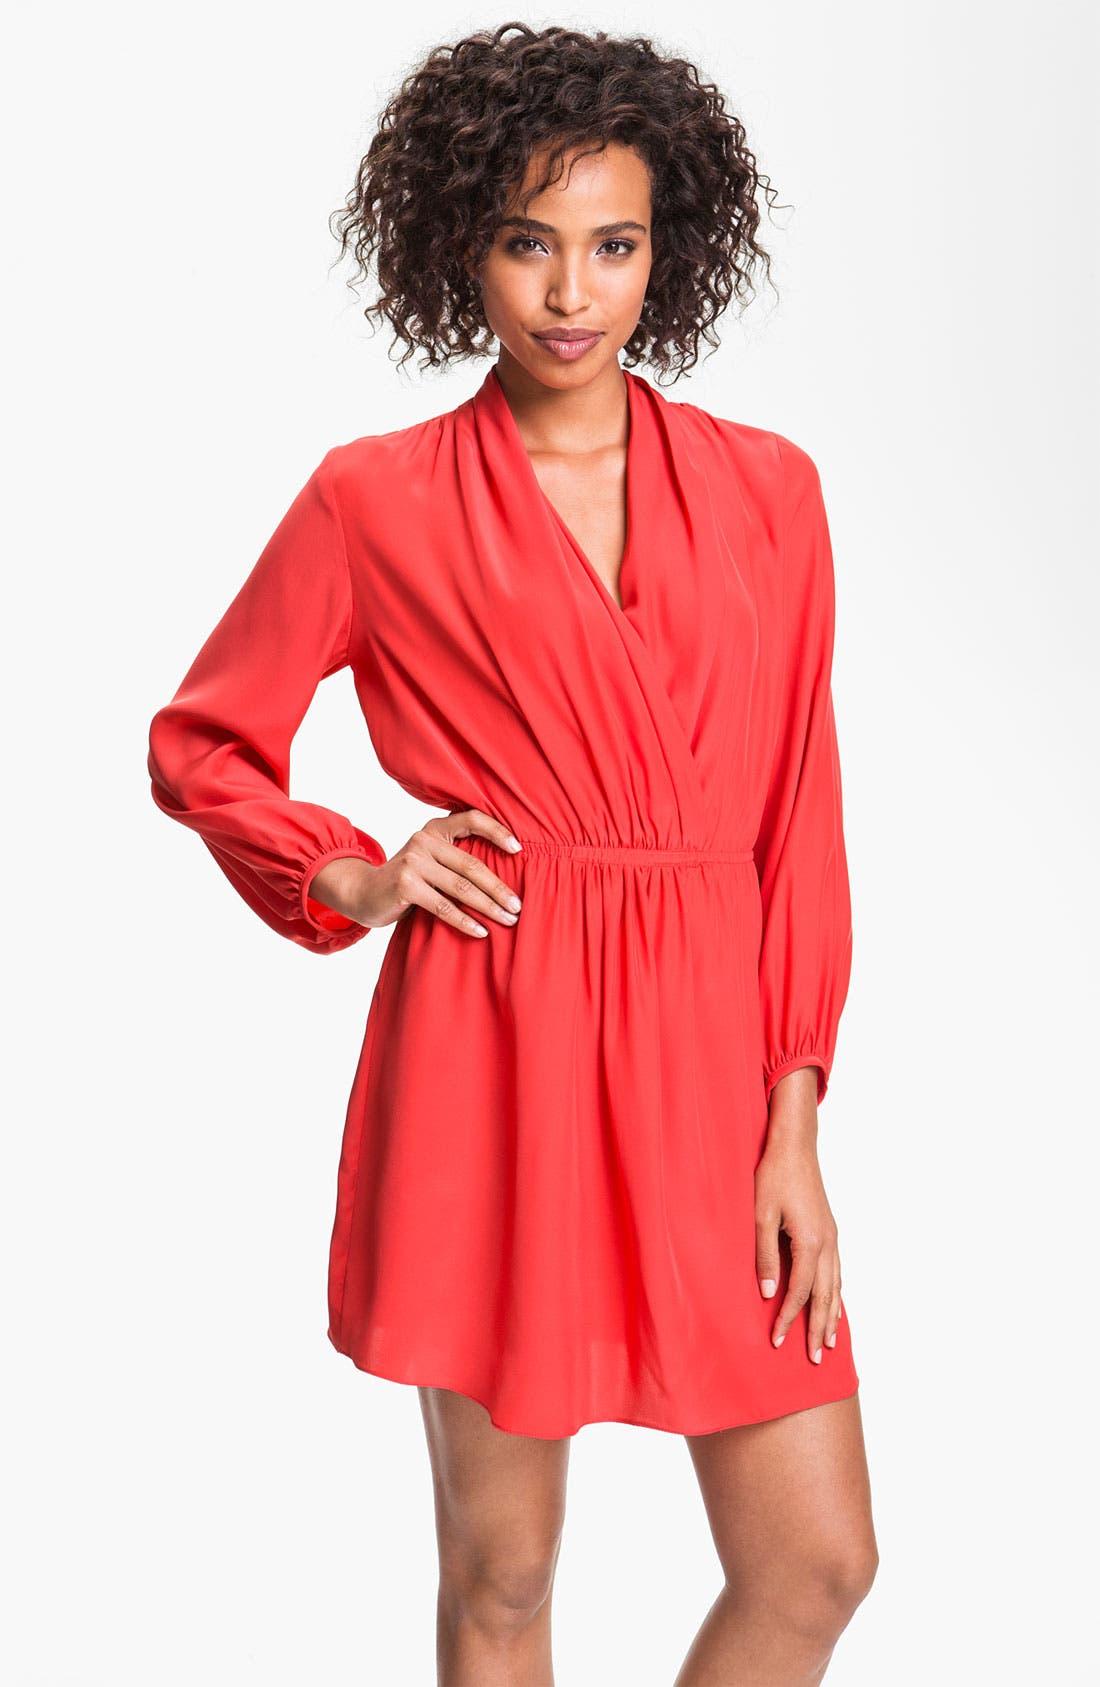 Alternate Image 1 Selected - ALICE & TRIXIE 'Joyce' Surplice Silk Blouson Dress